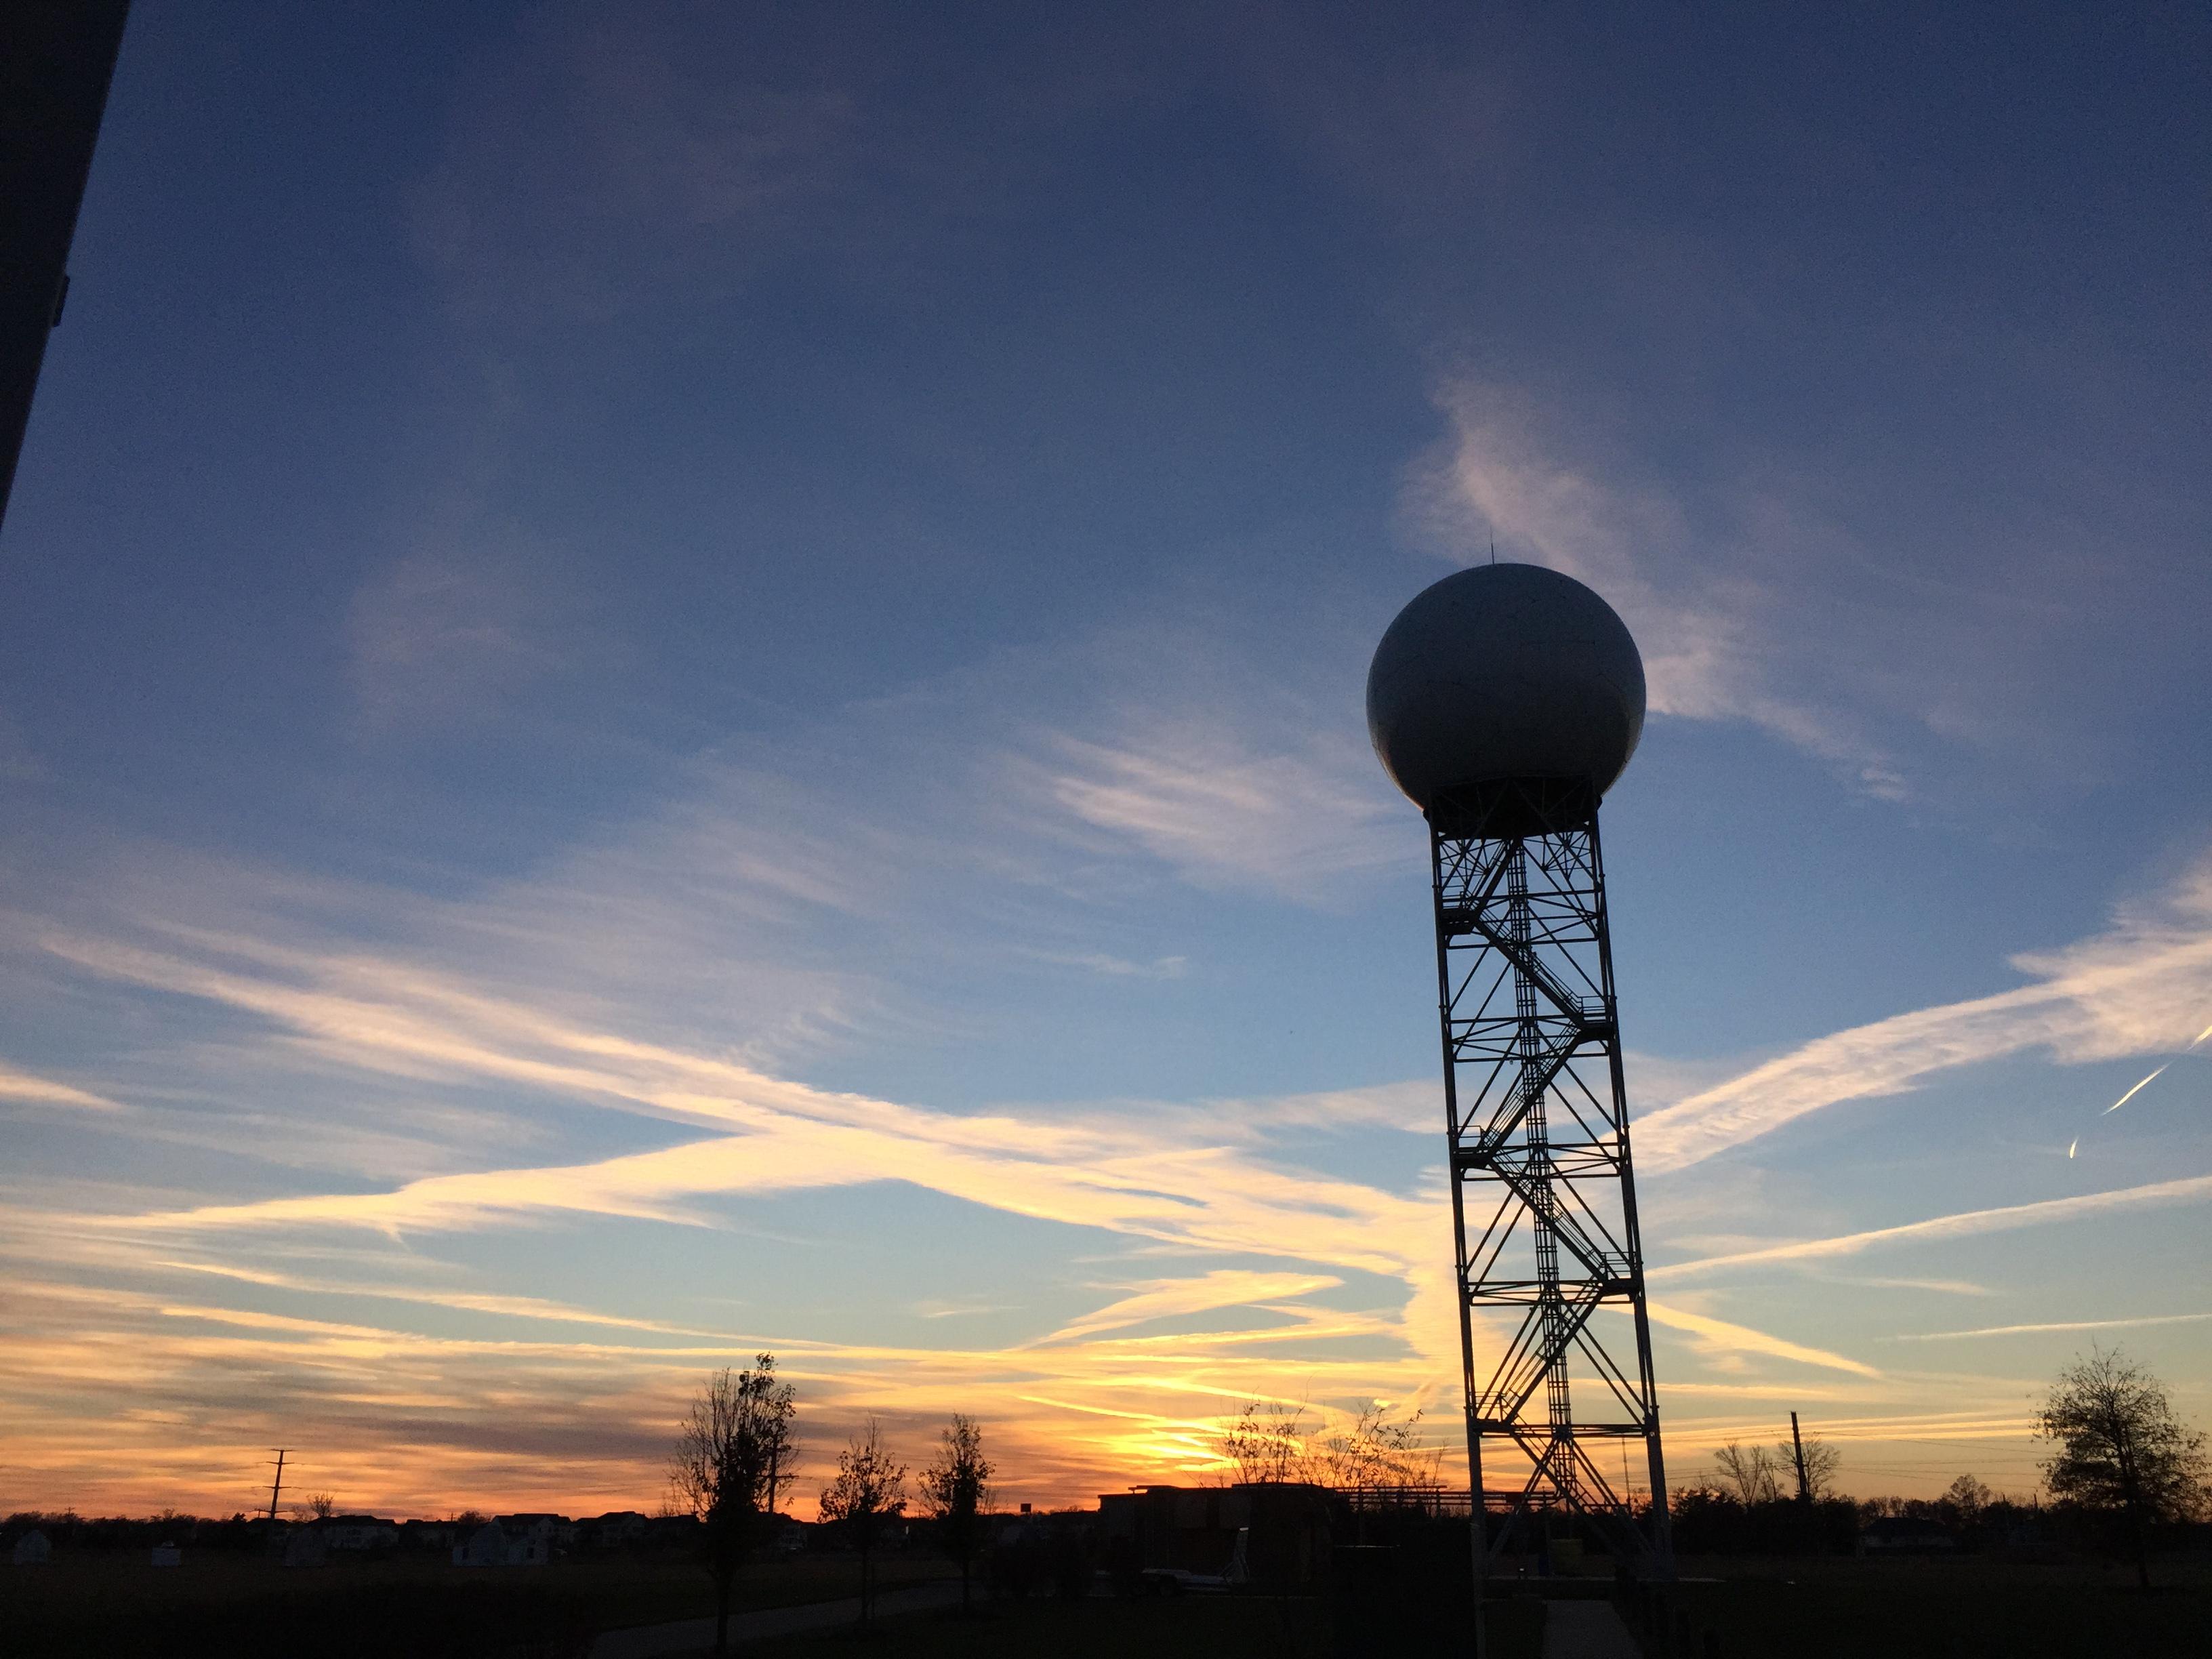 File:2015-11-21 16 49 01 Sunset at the NEXRAD WSR-88D Doppler Radar